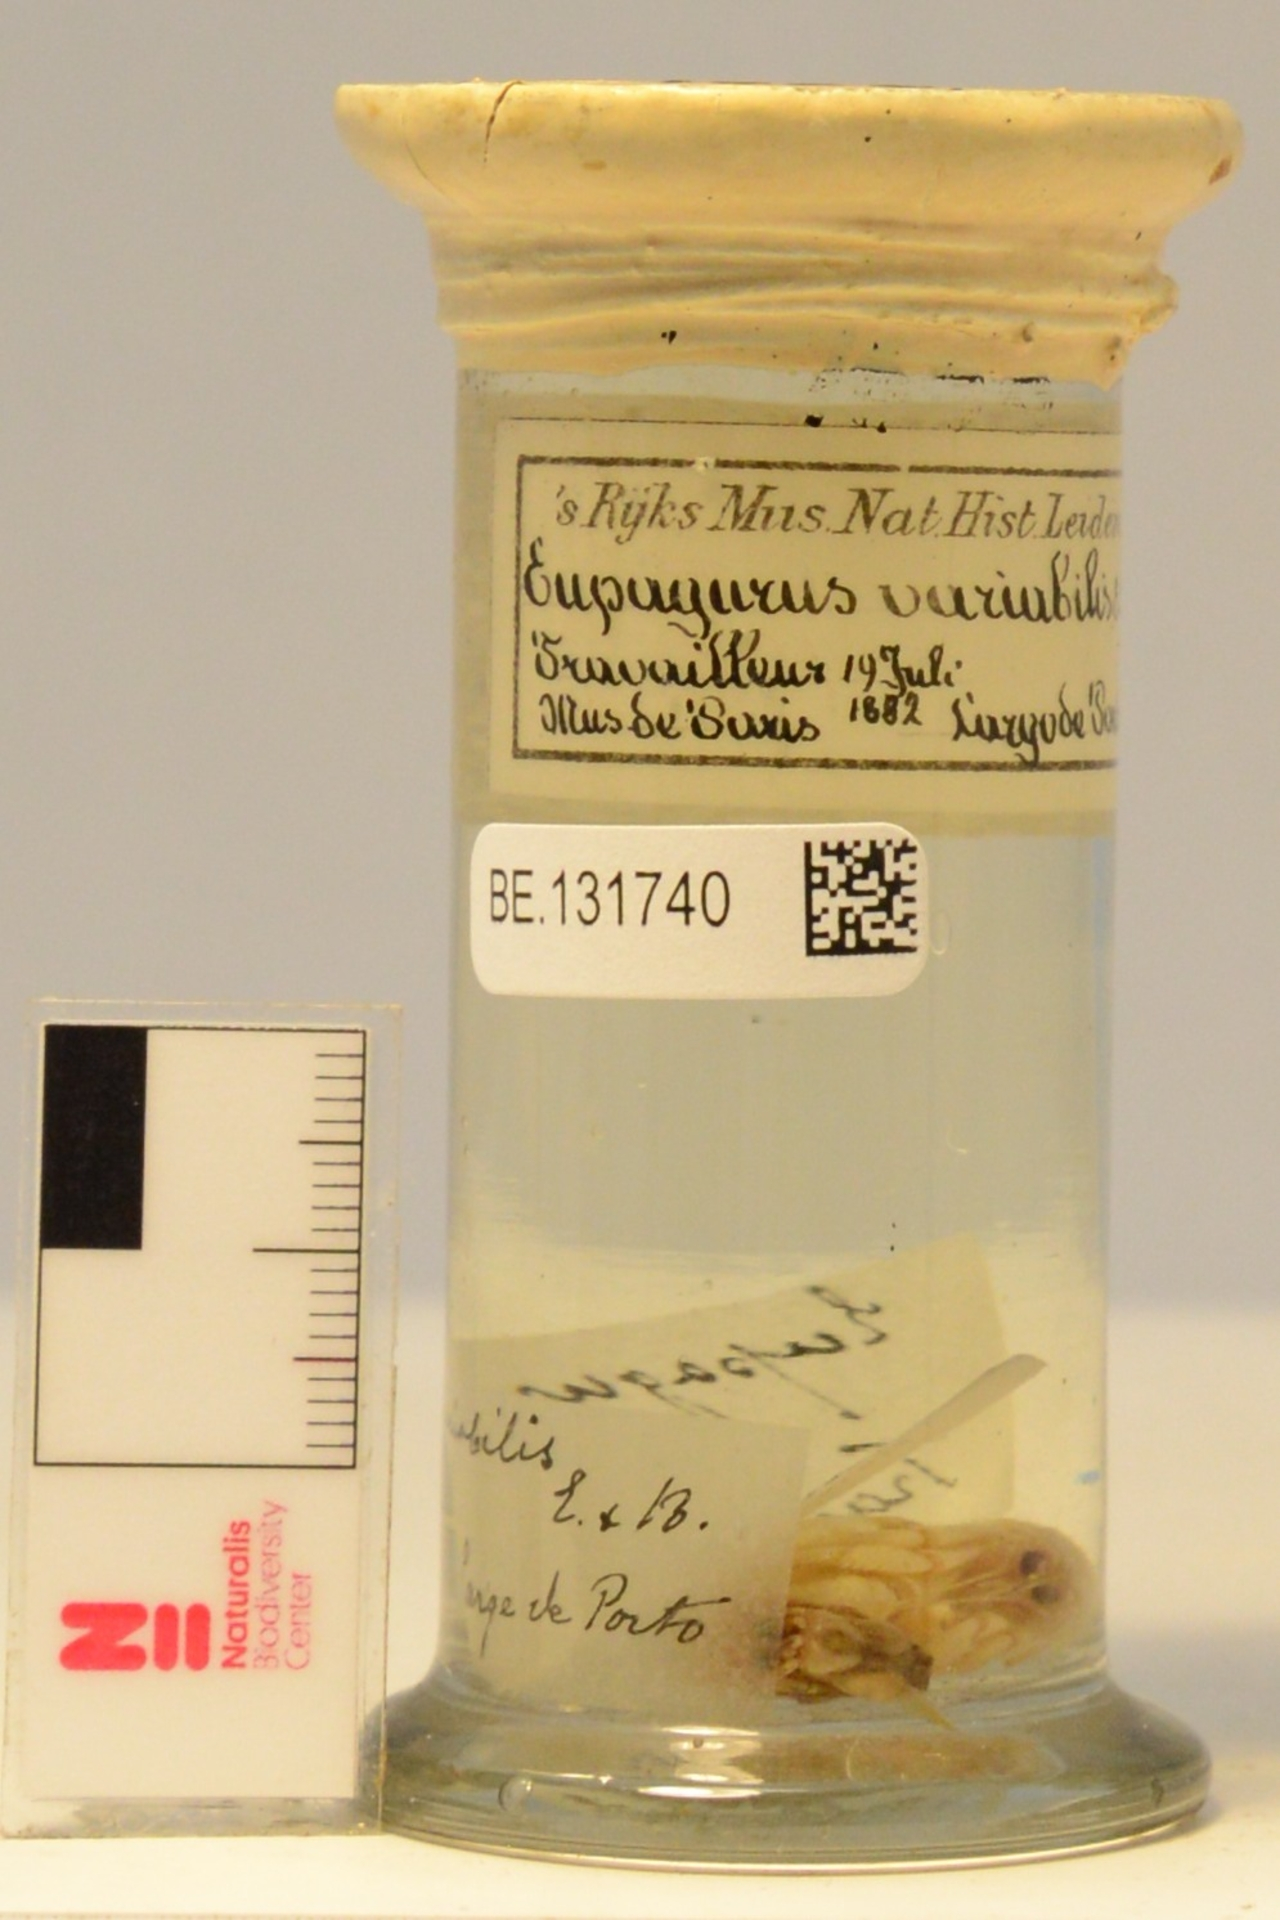 RMNH.CRUS.D.1666 | Pagurus alatus Fabricius, 1775